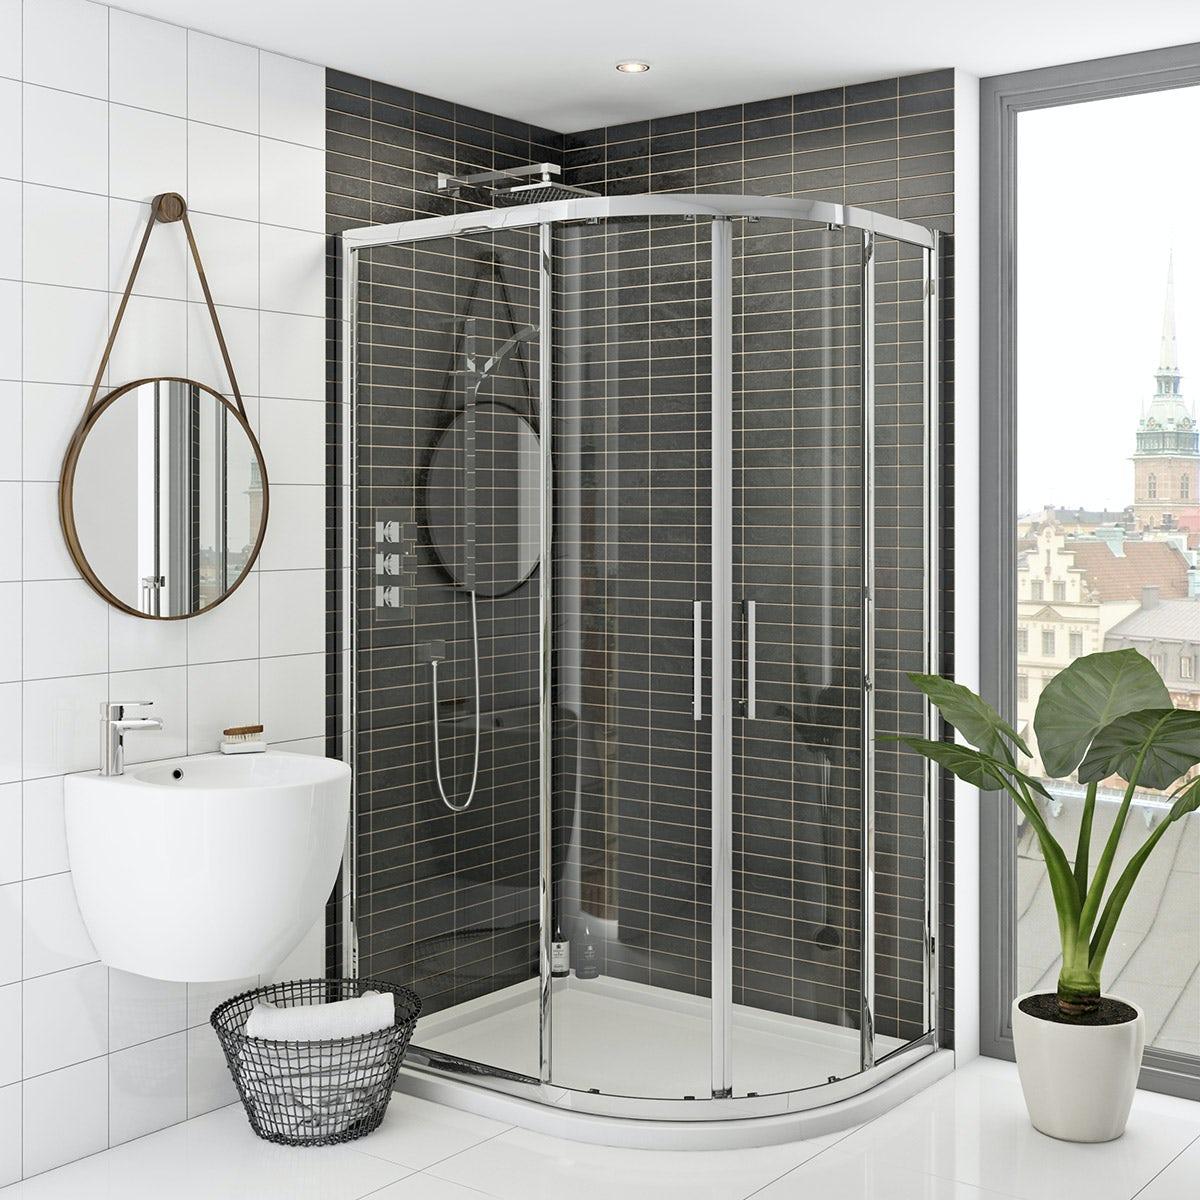 Mode Hardy premium 8mm easy clean offset quadrant shower enclosure